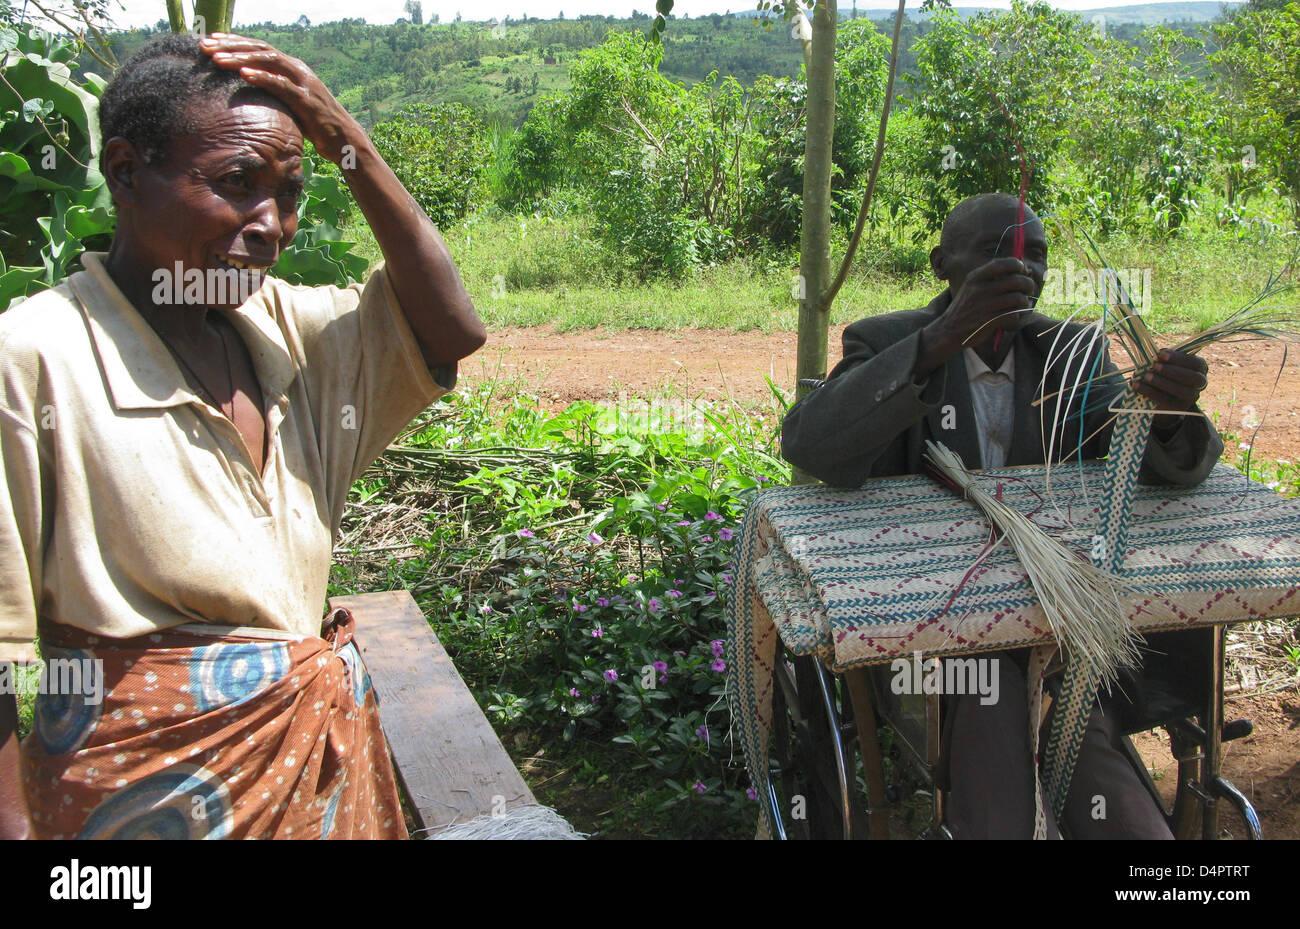 Pierre Celestine Karimumrumba and his wife Stephania Mukantenera bind straw mats in front of their house in Gahanga, - Stock Image